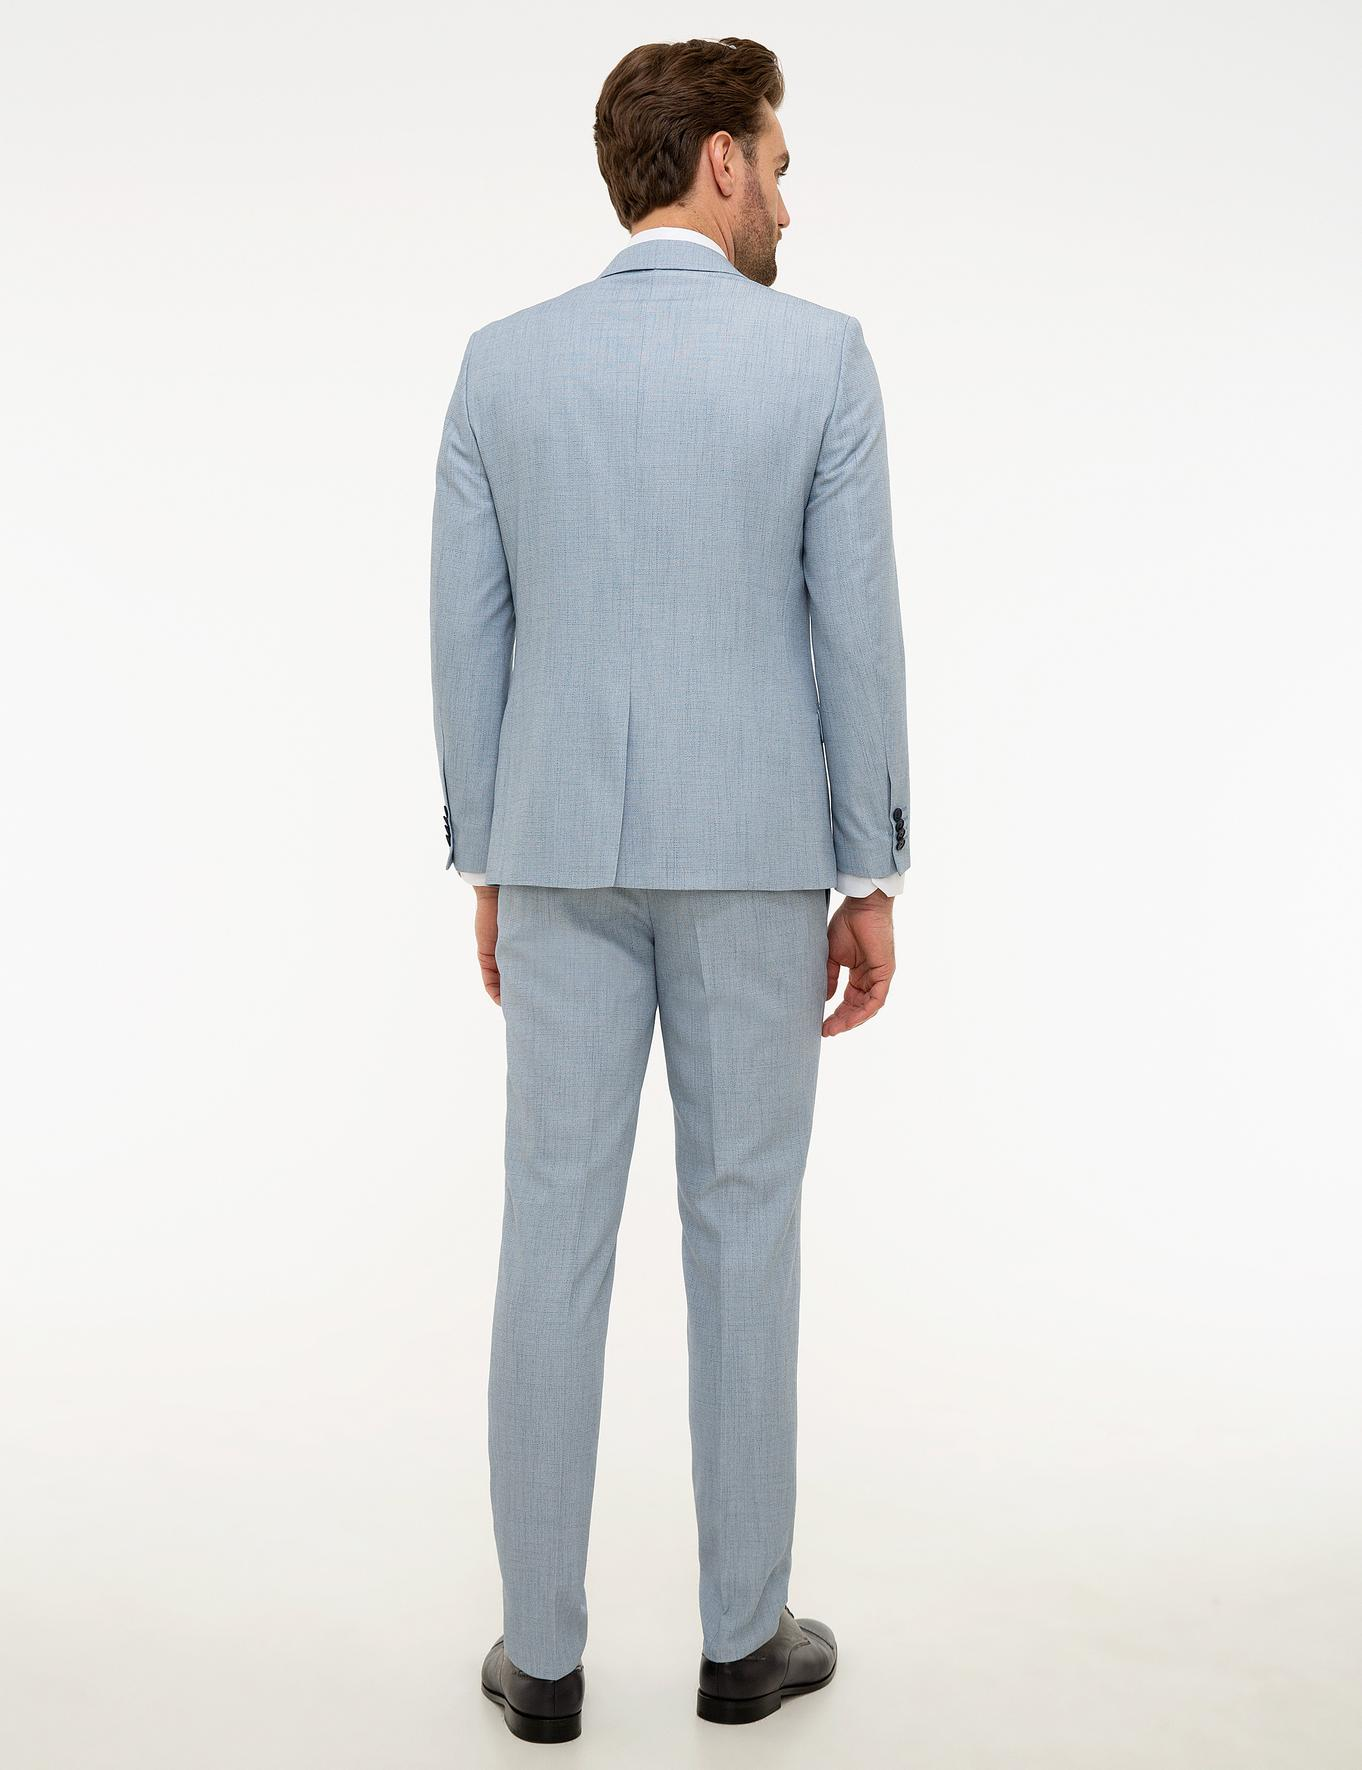 Açık Mavi Ekstra Slim Fit Takım Elbise